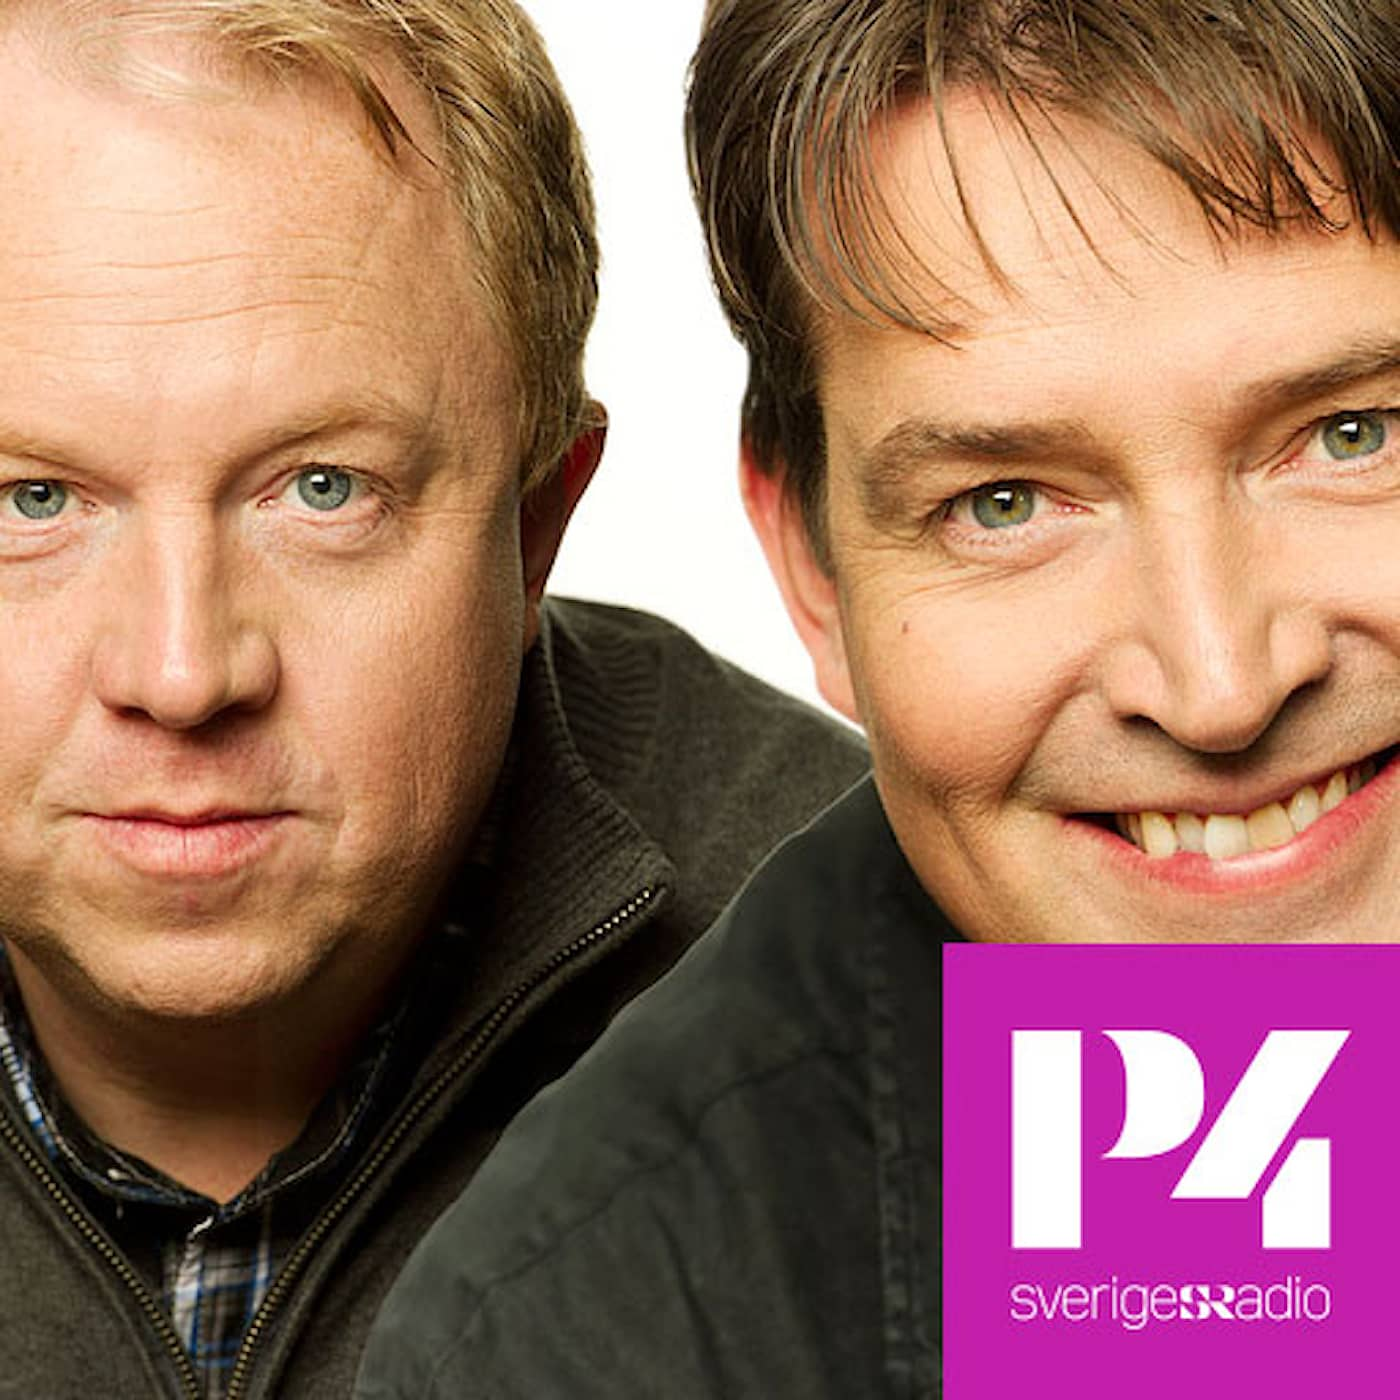 Jansson & Wester i P4  (sänds inte längre)